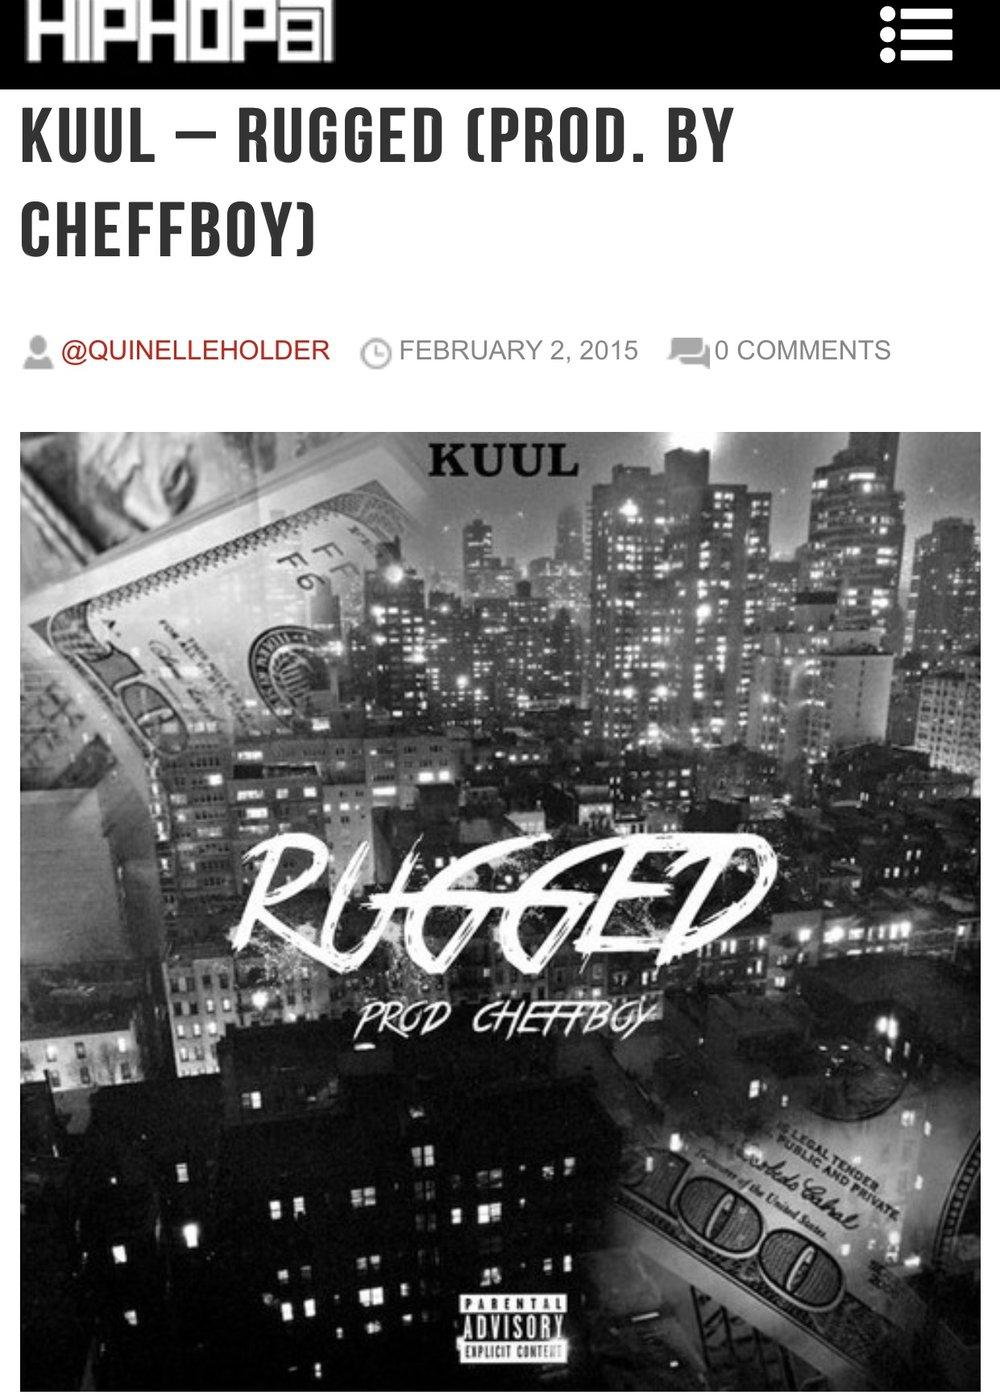 KuuL_Rugged_Hip_Hop_Since_87